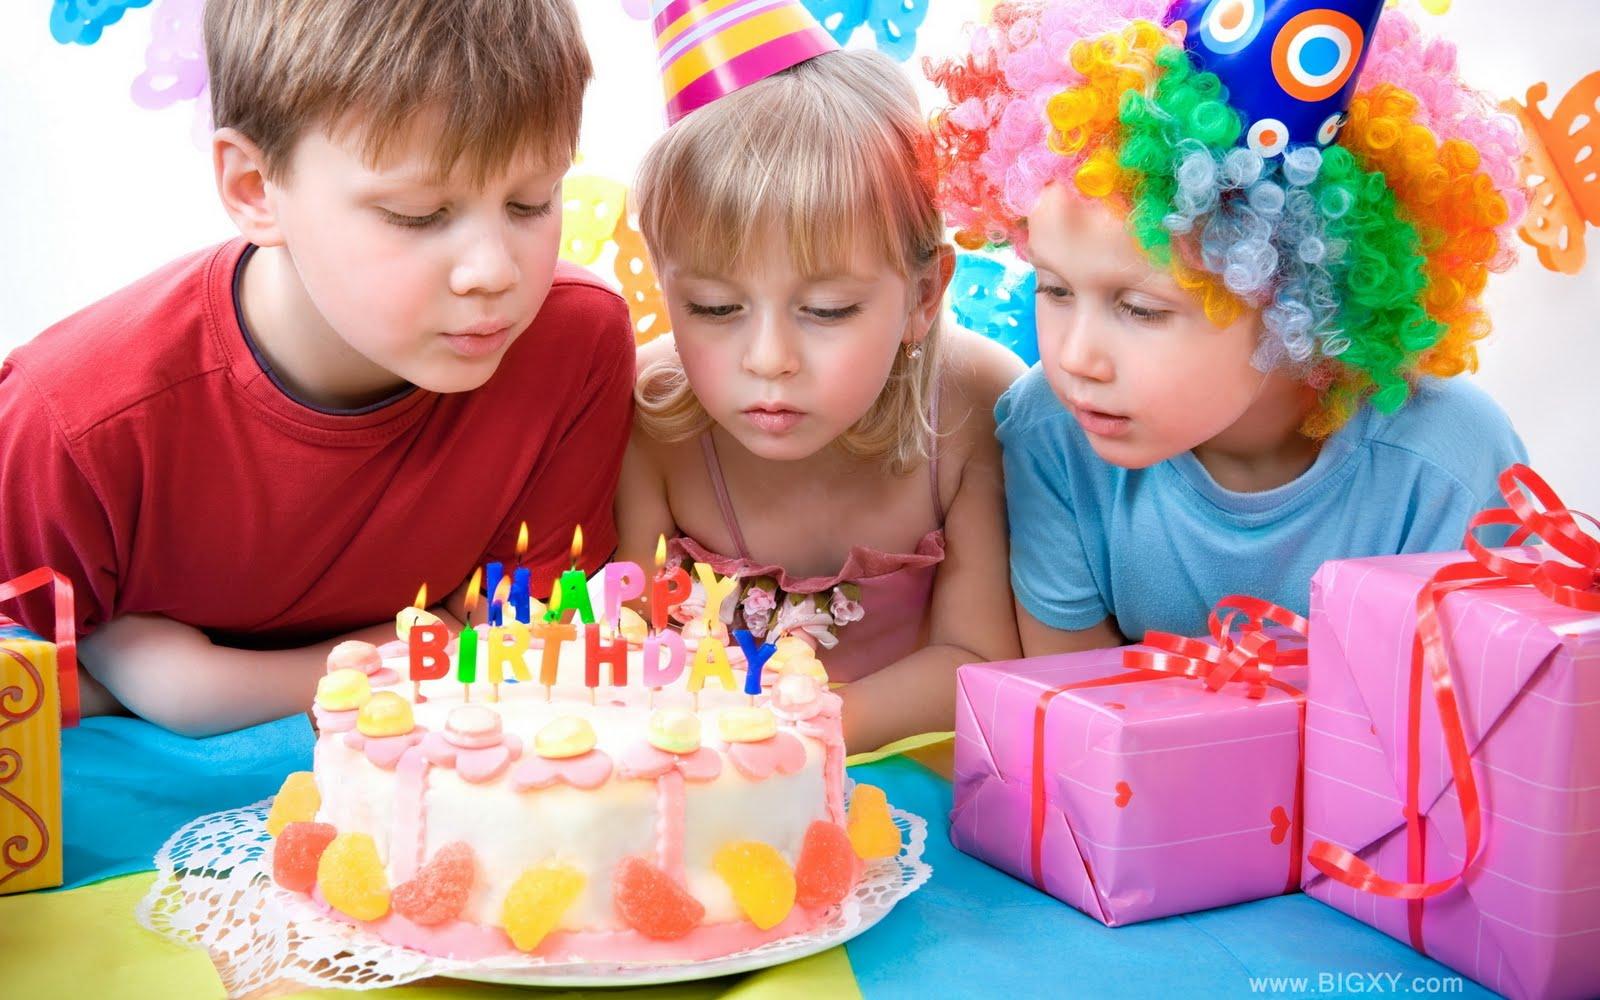 feliz-cumpleaños-happy-birthday-party-1920x1200